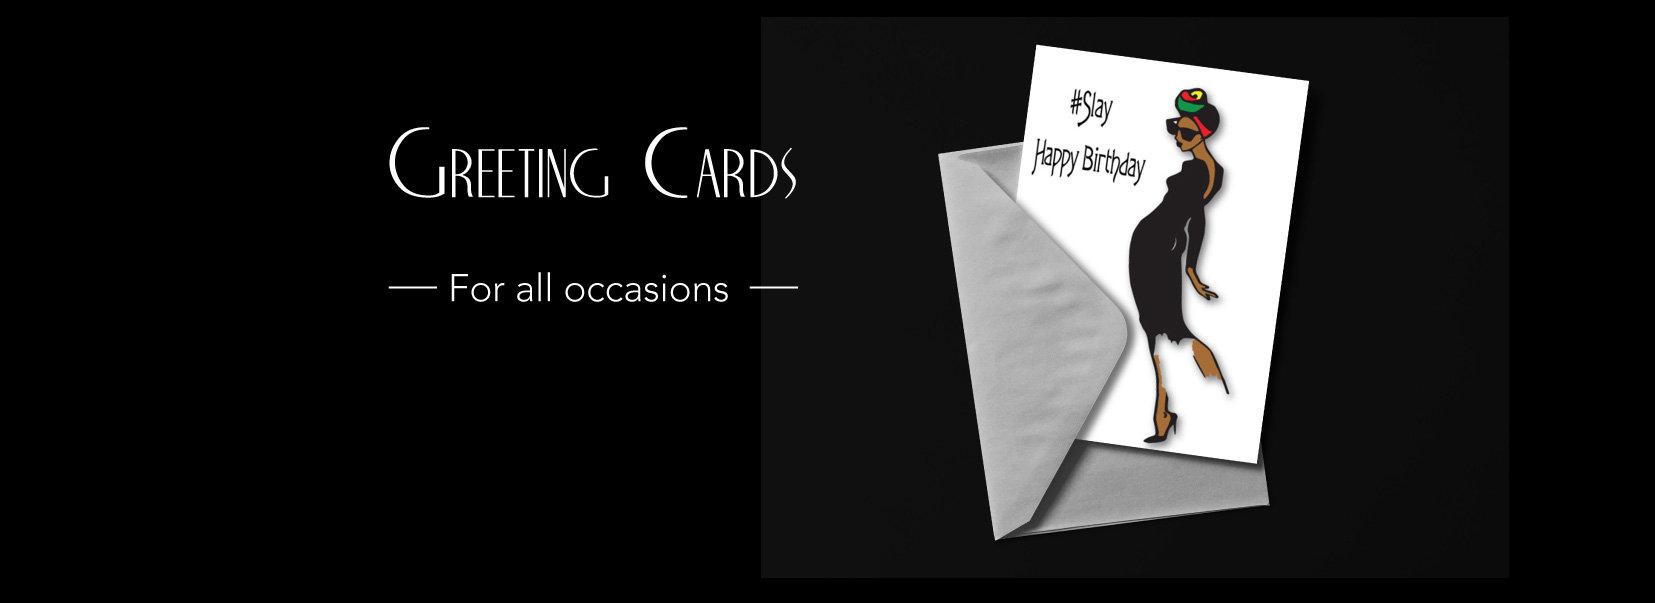 bd-banner-greeting-card.jpg